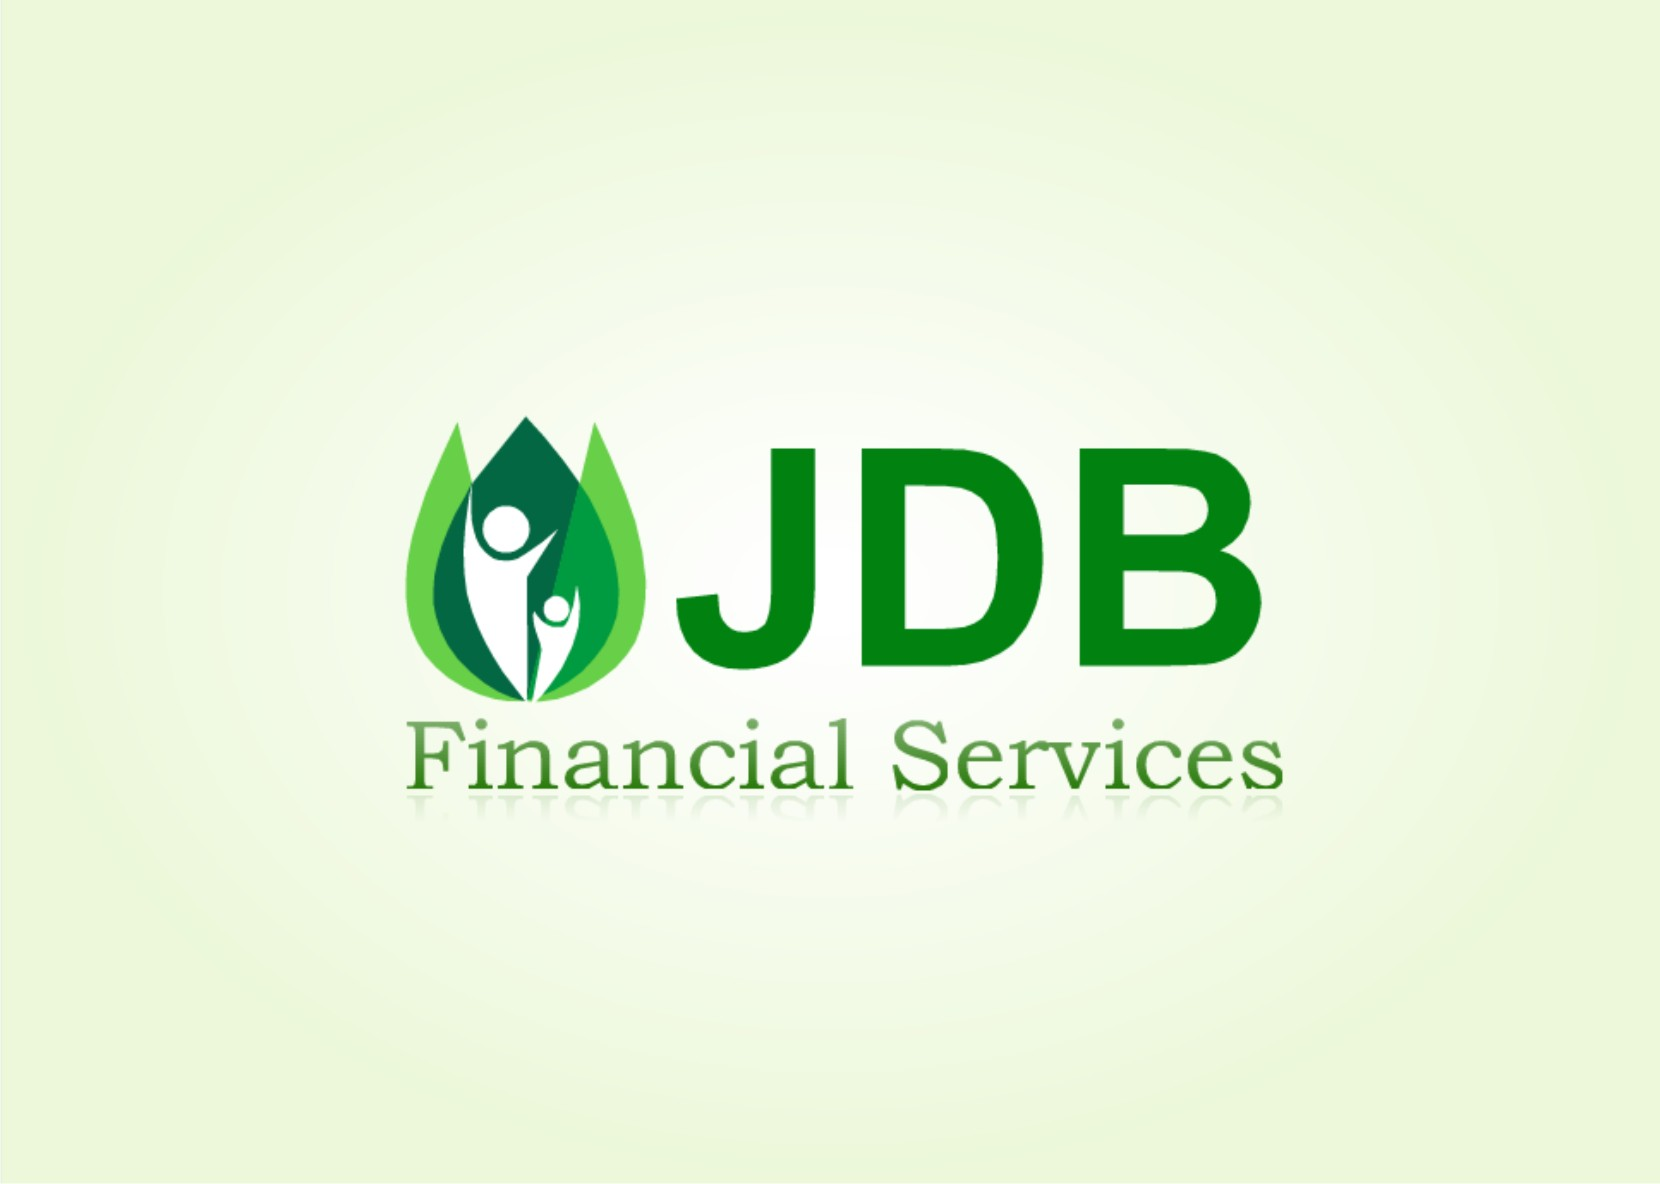 Logo Design by Shailender Kumar - Entry No. 138 in the Logo Design Contest Unique Logo Design Wanted for JDB Financial Services.